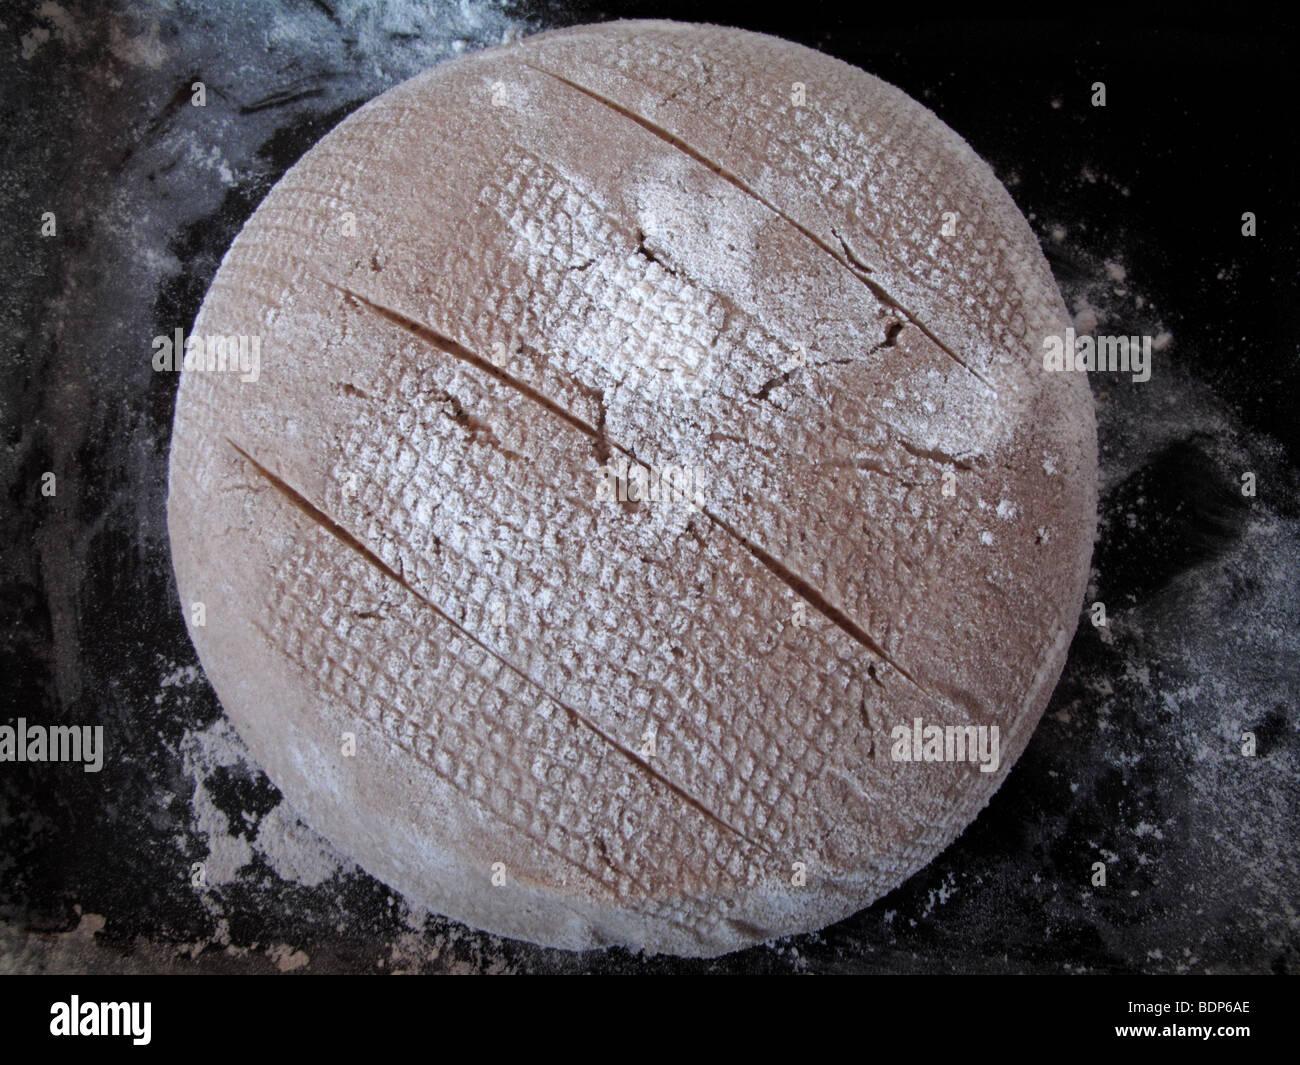 Sourdough bread ready for baking - Stock Image